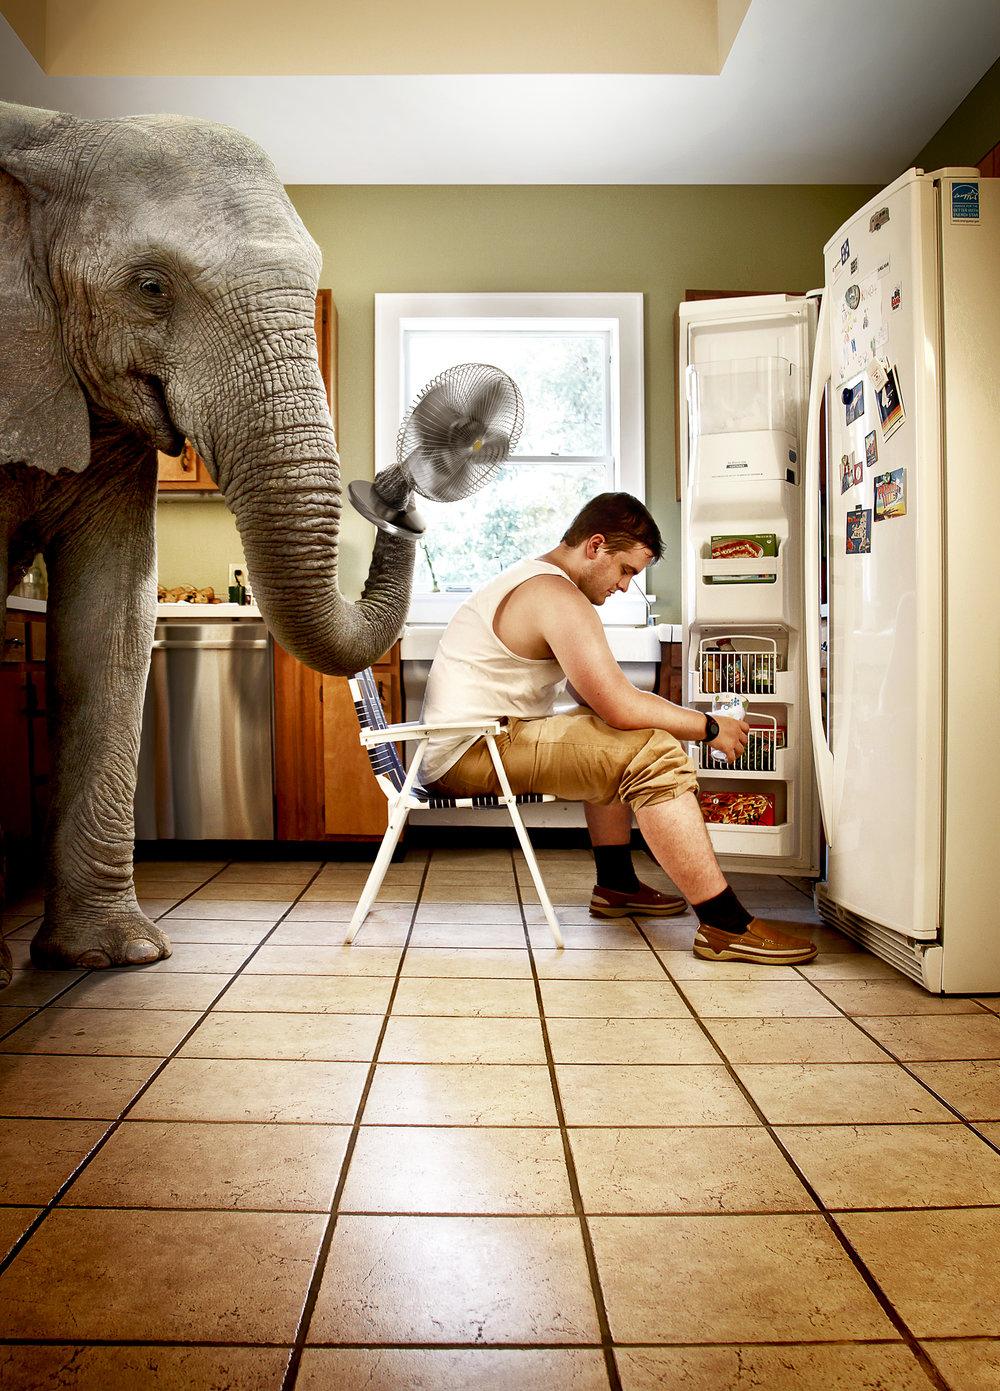 elephant_kitchen@465.jpg